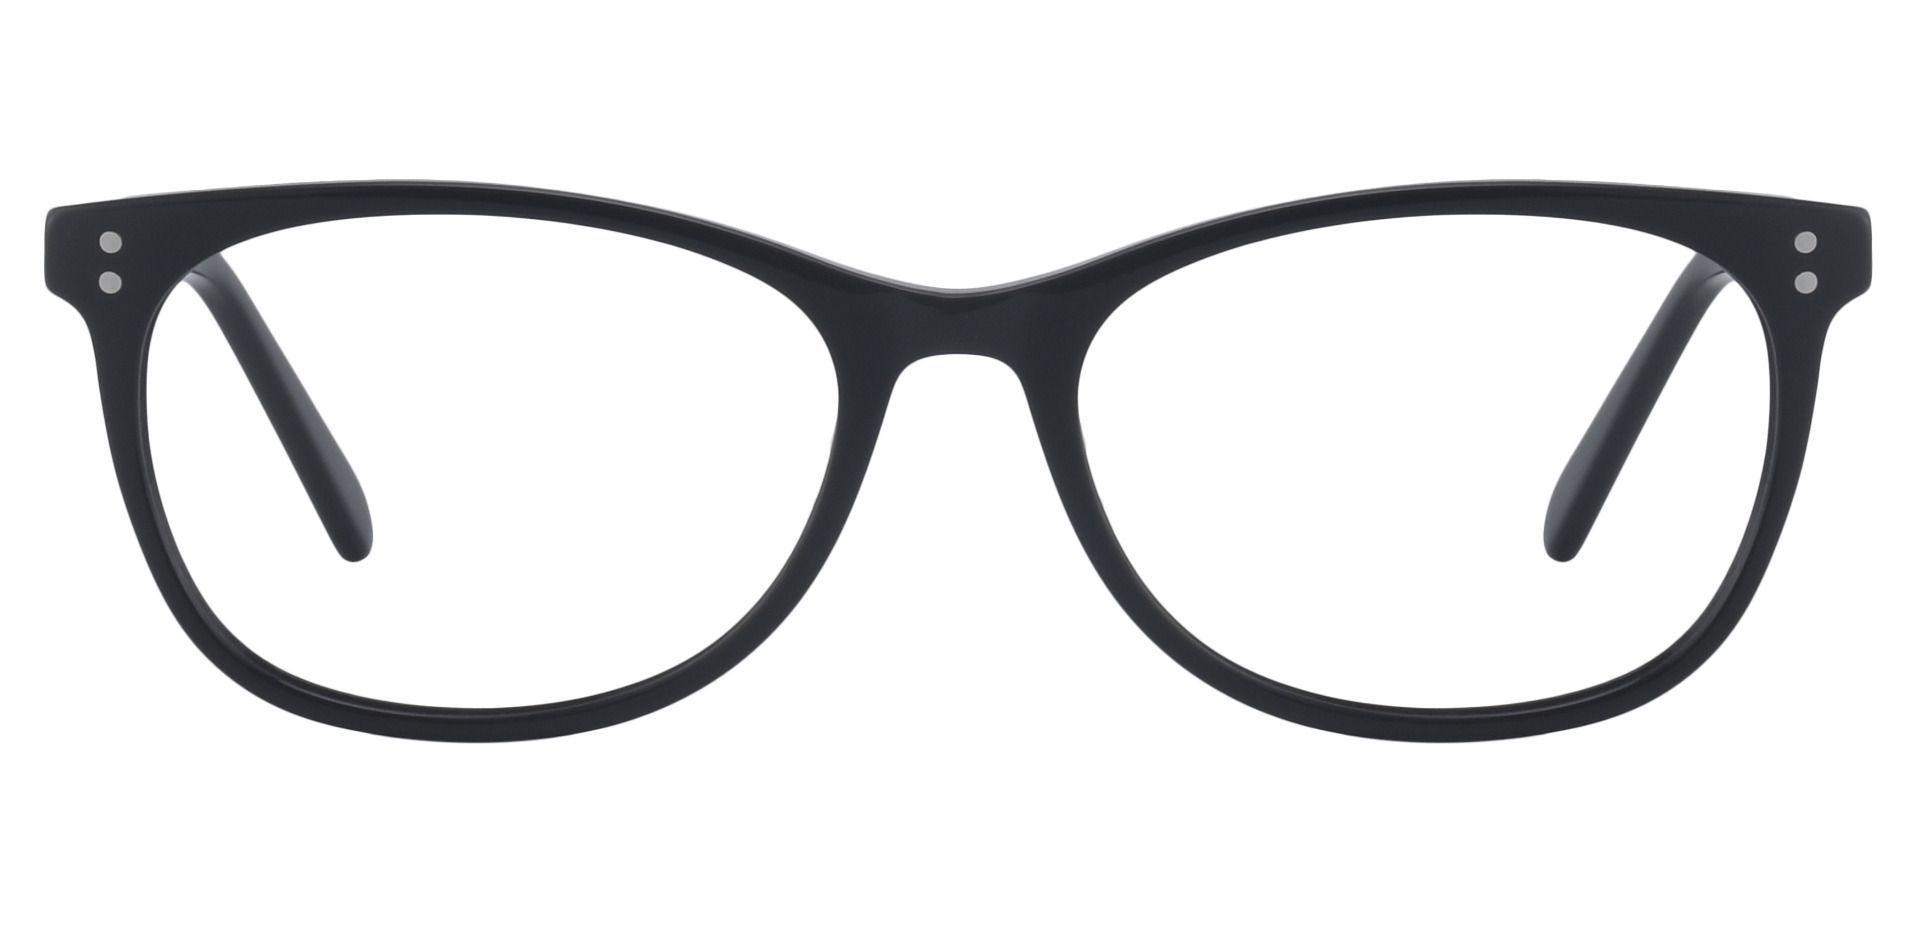 Laguna Rectangle Prescription Glasses - Black